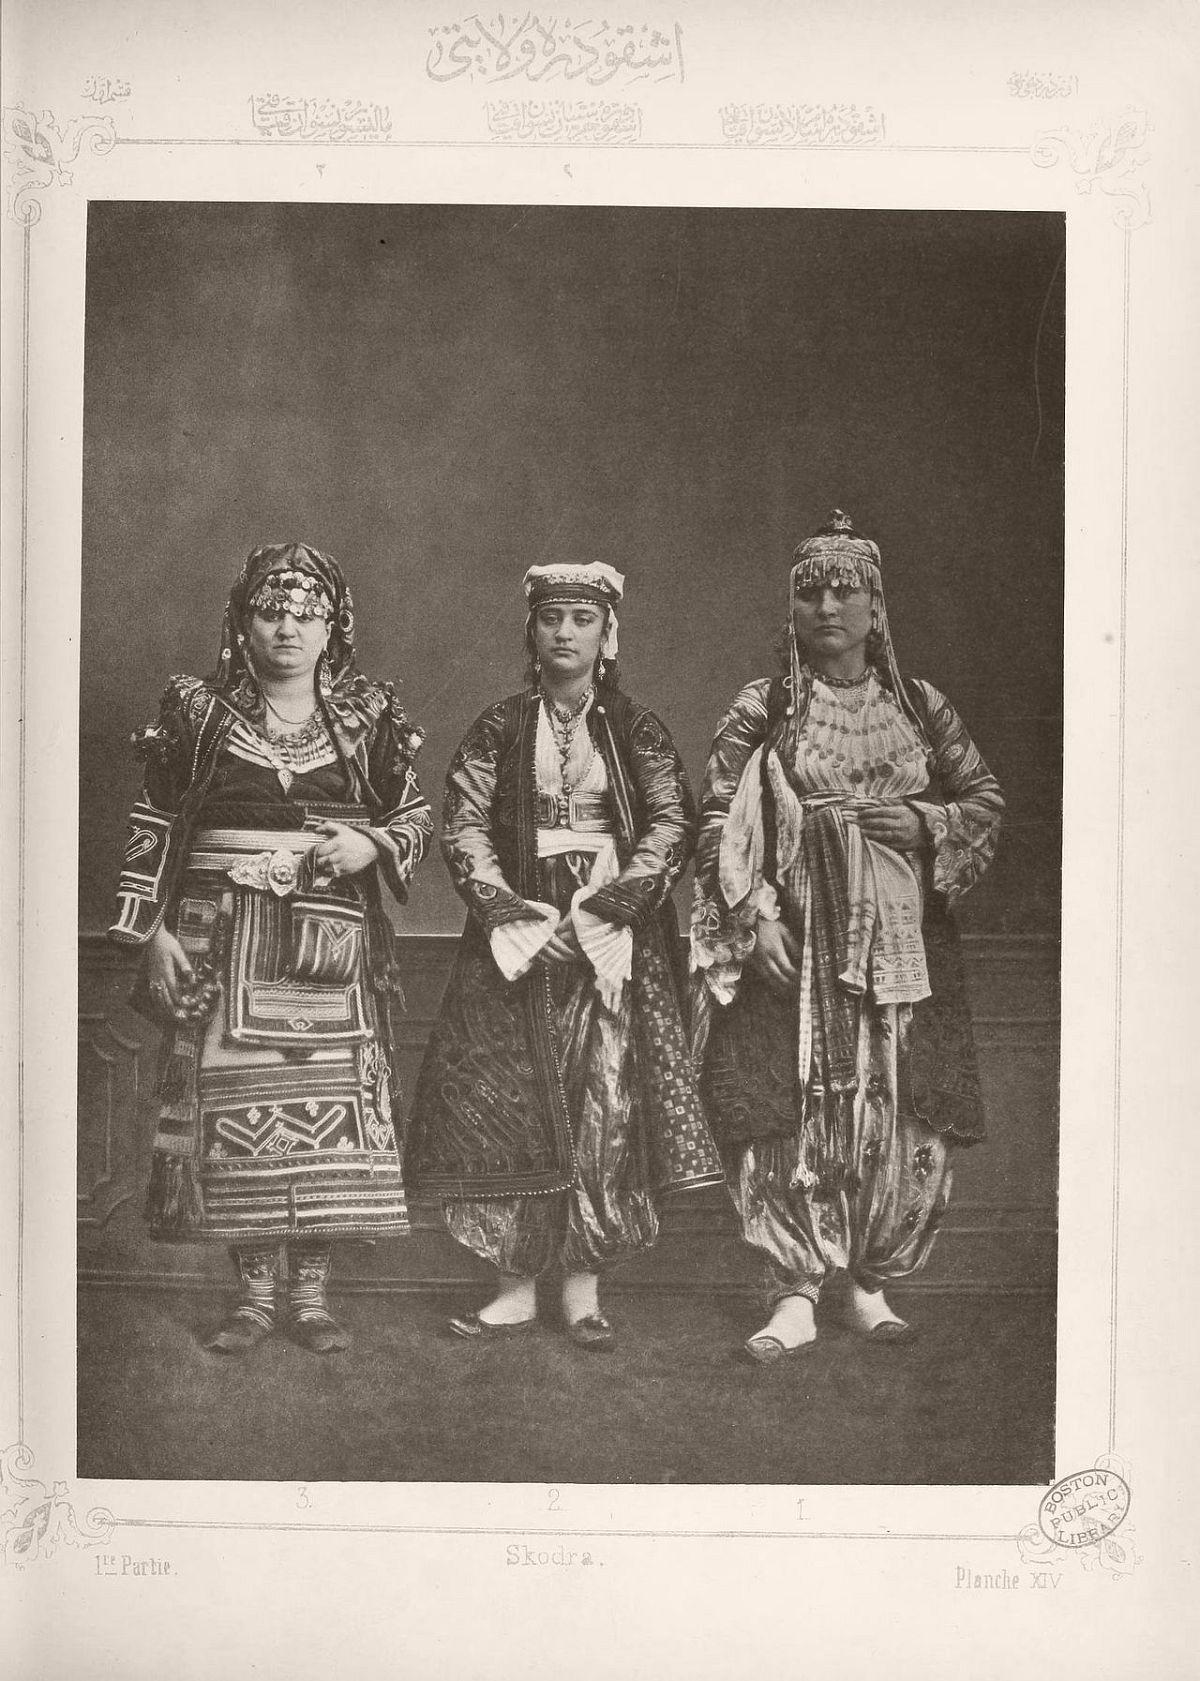 1: Muslim lady from Shkodër 2. Christian lady from Shkodër 3. Peasant woman from Malissor